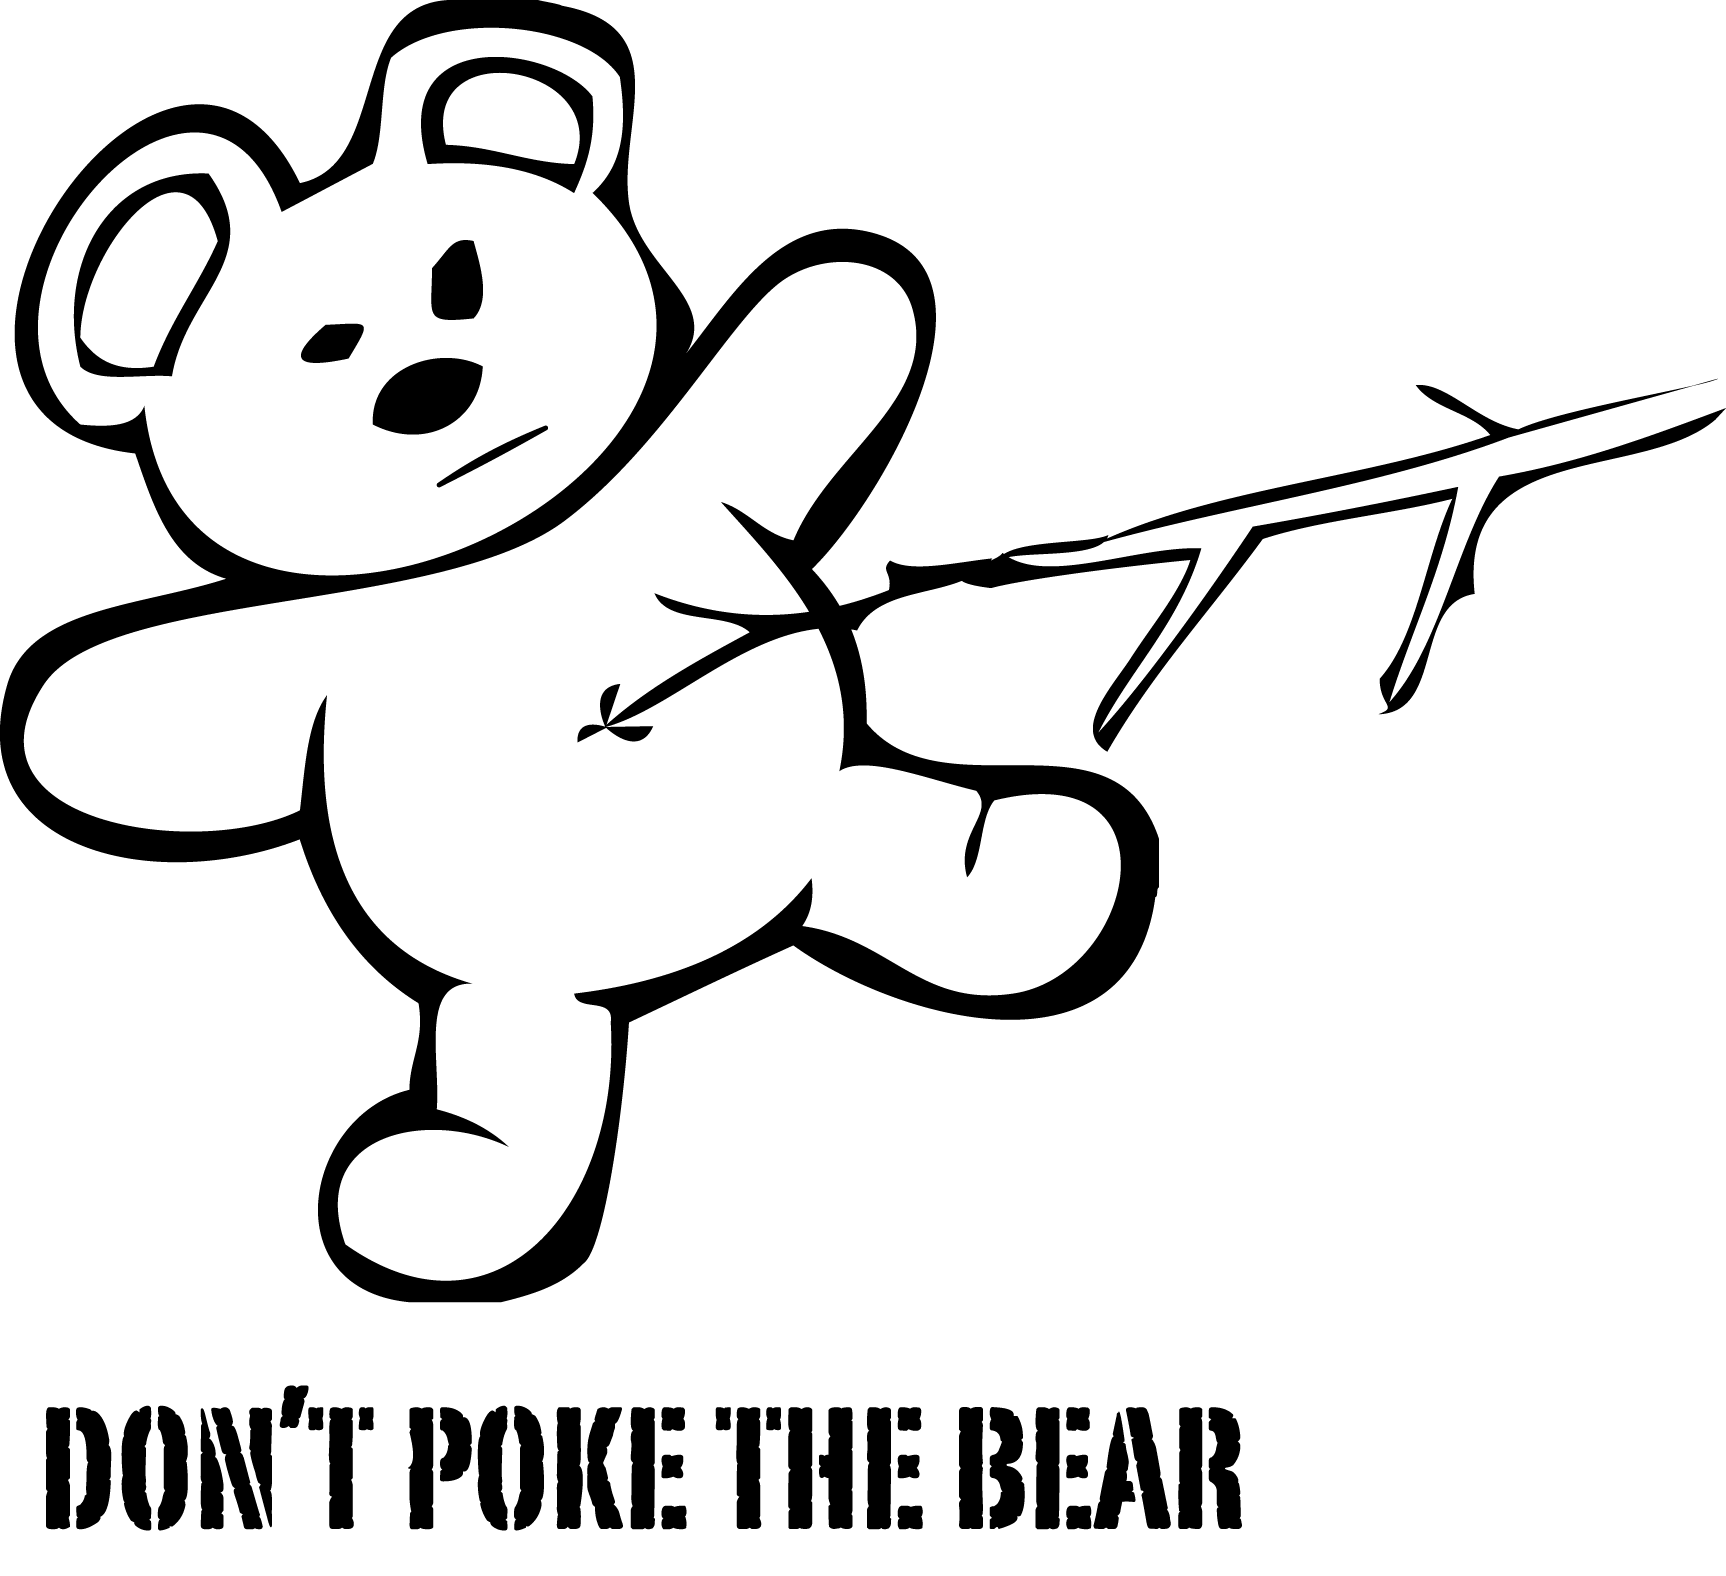 Poke The Bear Poke The Bear Oh My God He Ising